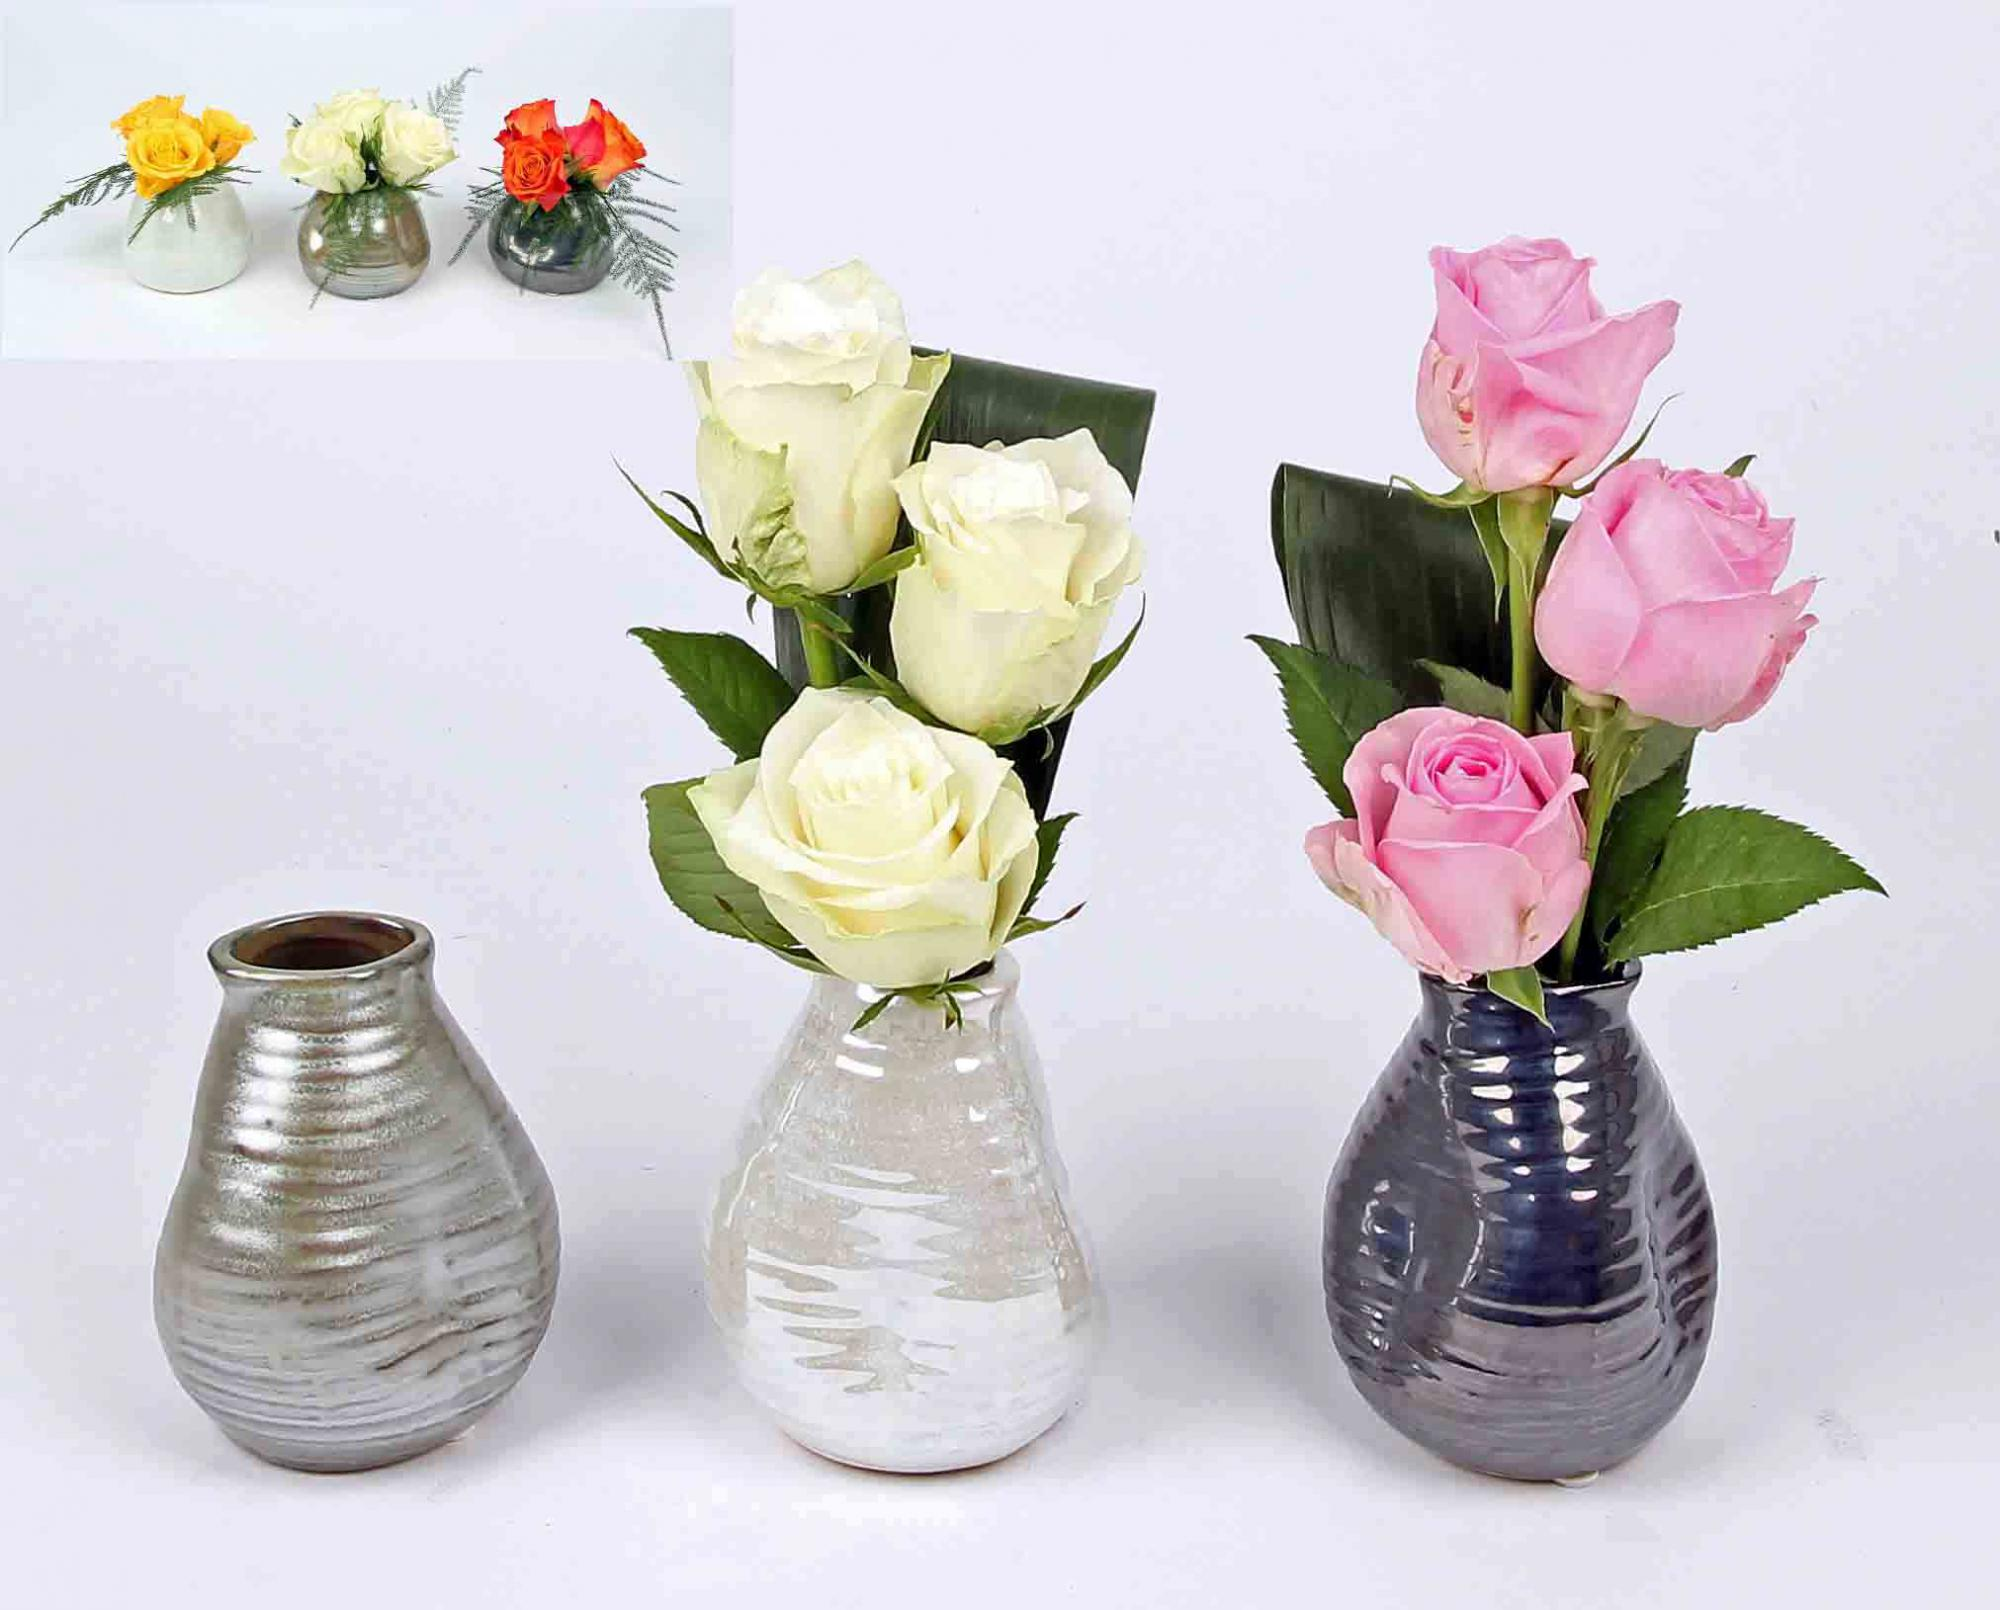 Trendy deco vaasje met 3 rozen